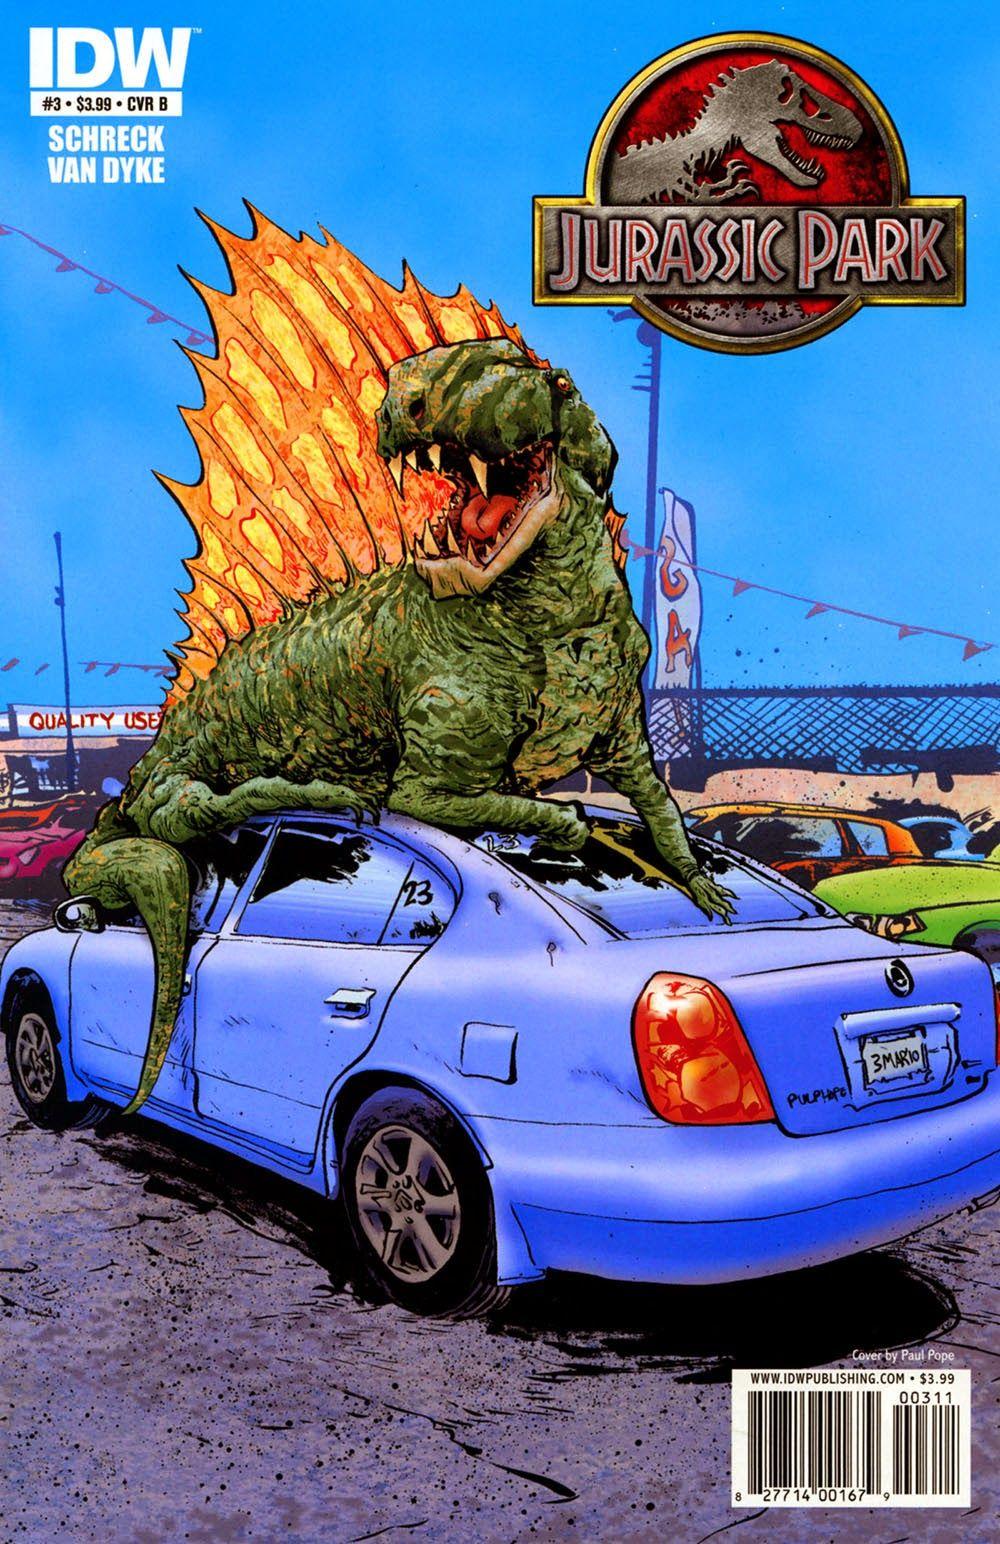 Jurassic Park 003 ……………………………… | Viewcomic reading comics